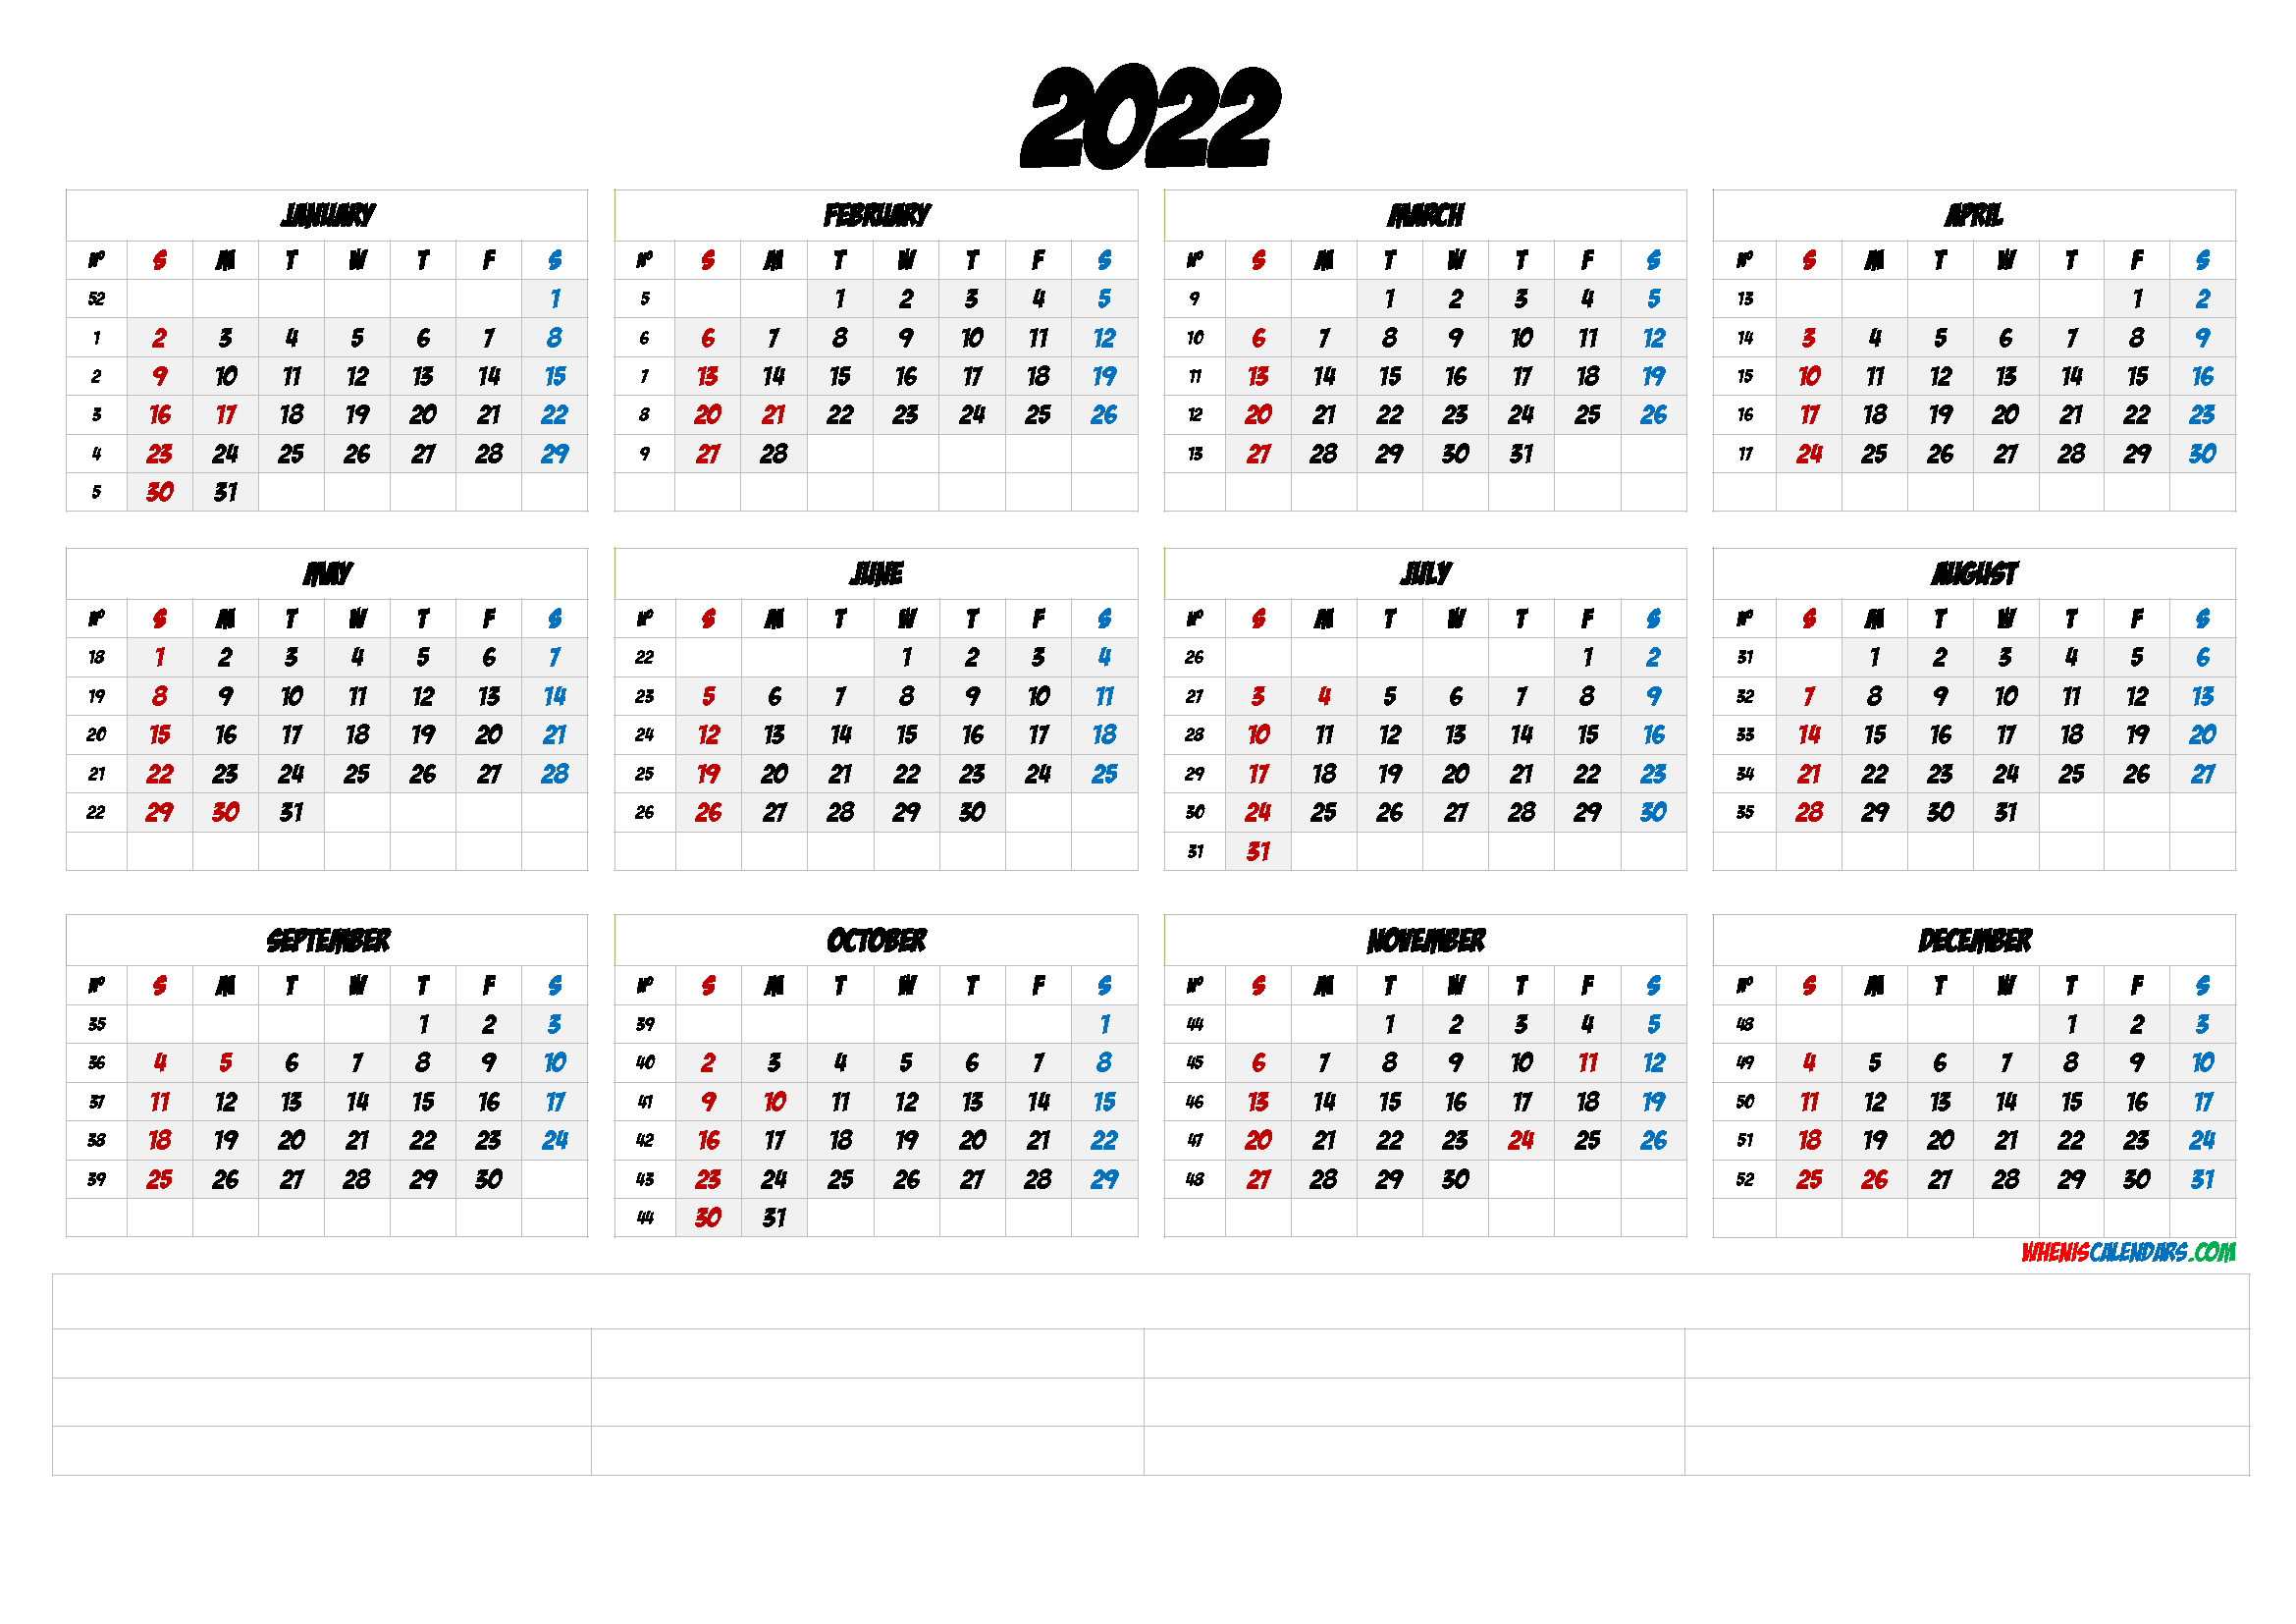 2022 Free Printable Yearly Calendar With Week Numbers Regarding January 2022 Calendar Large Font